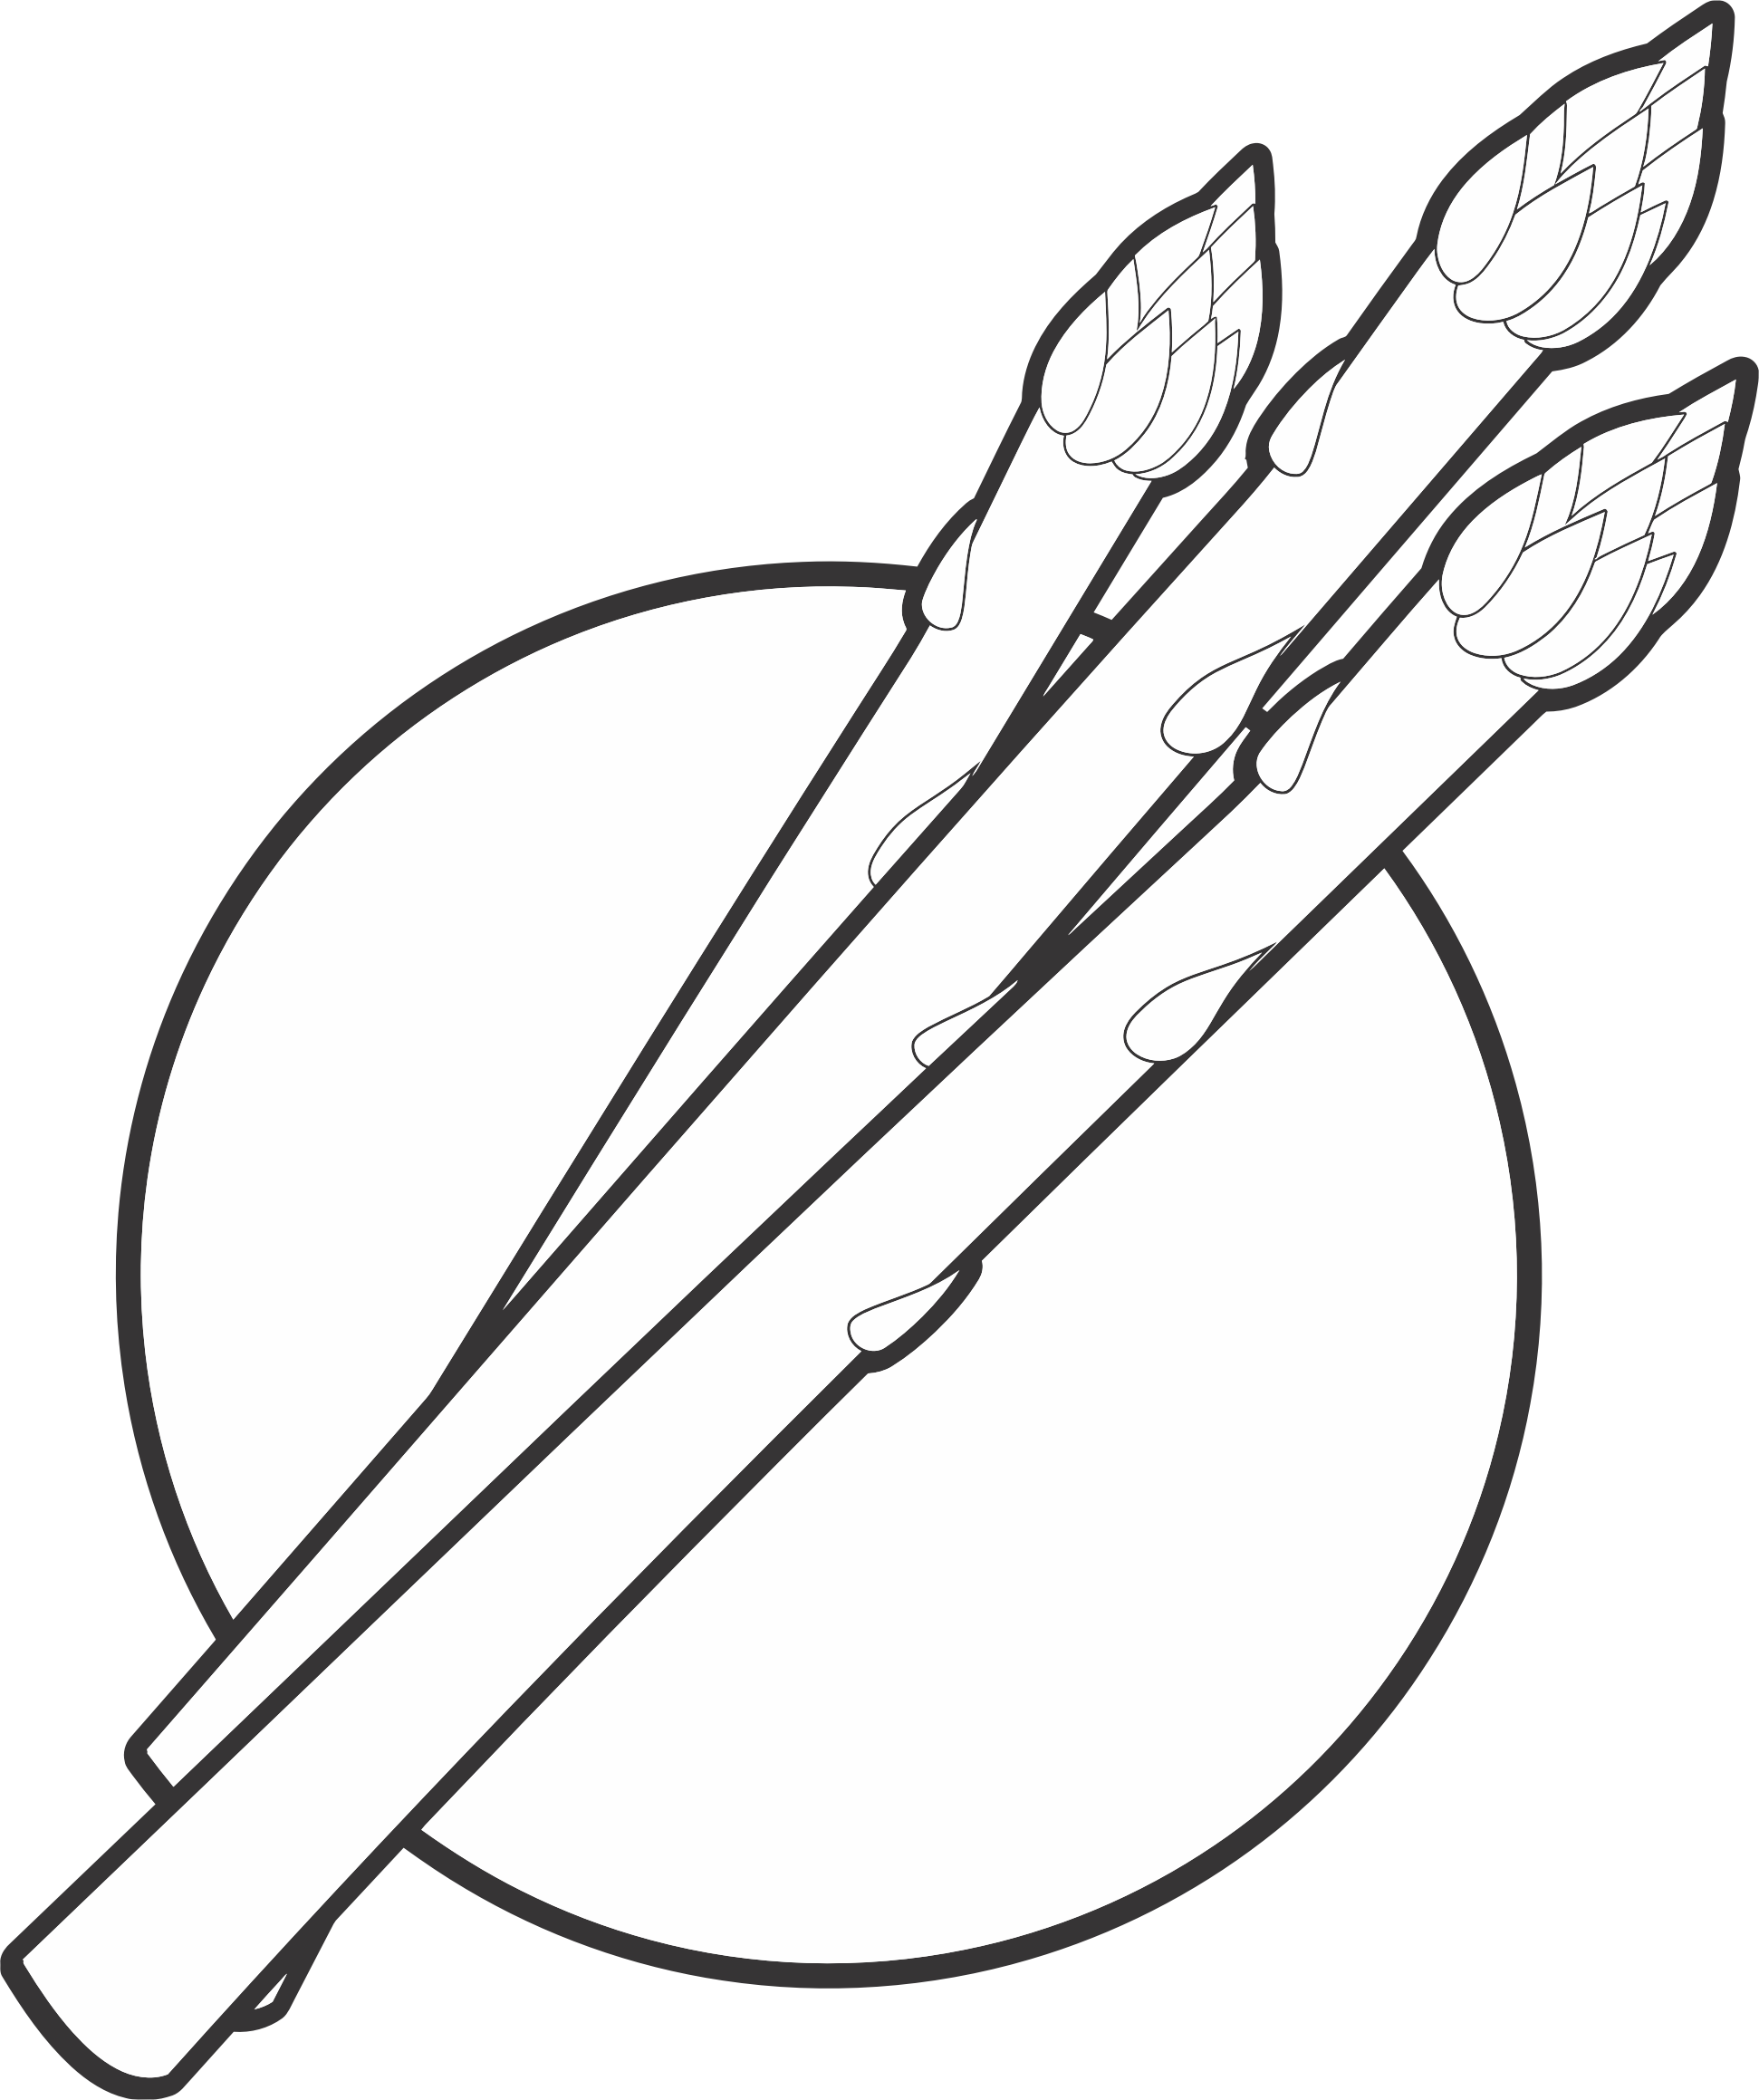 Asparagus clipart black and white Line Art White Gallery Asparagus